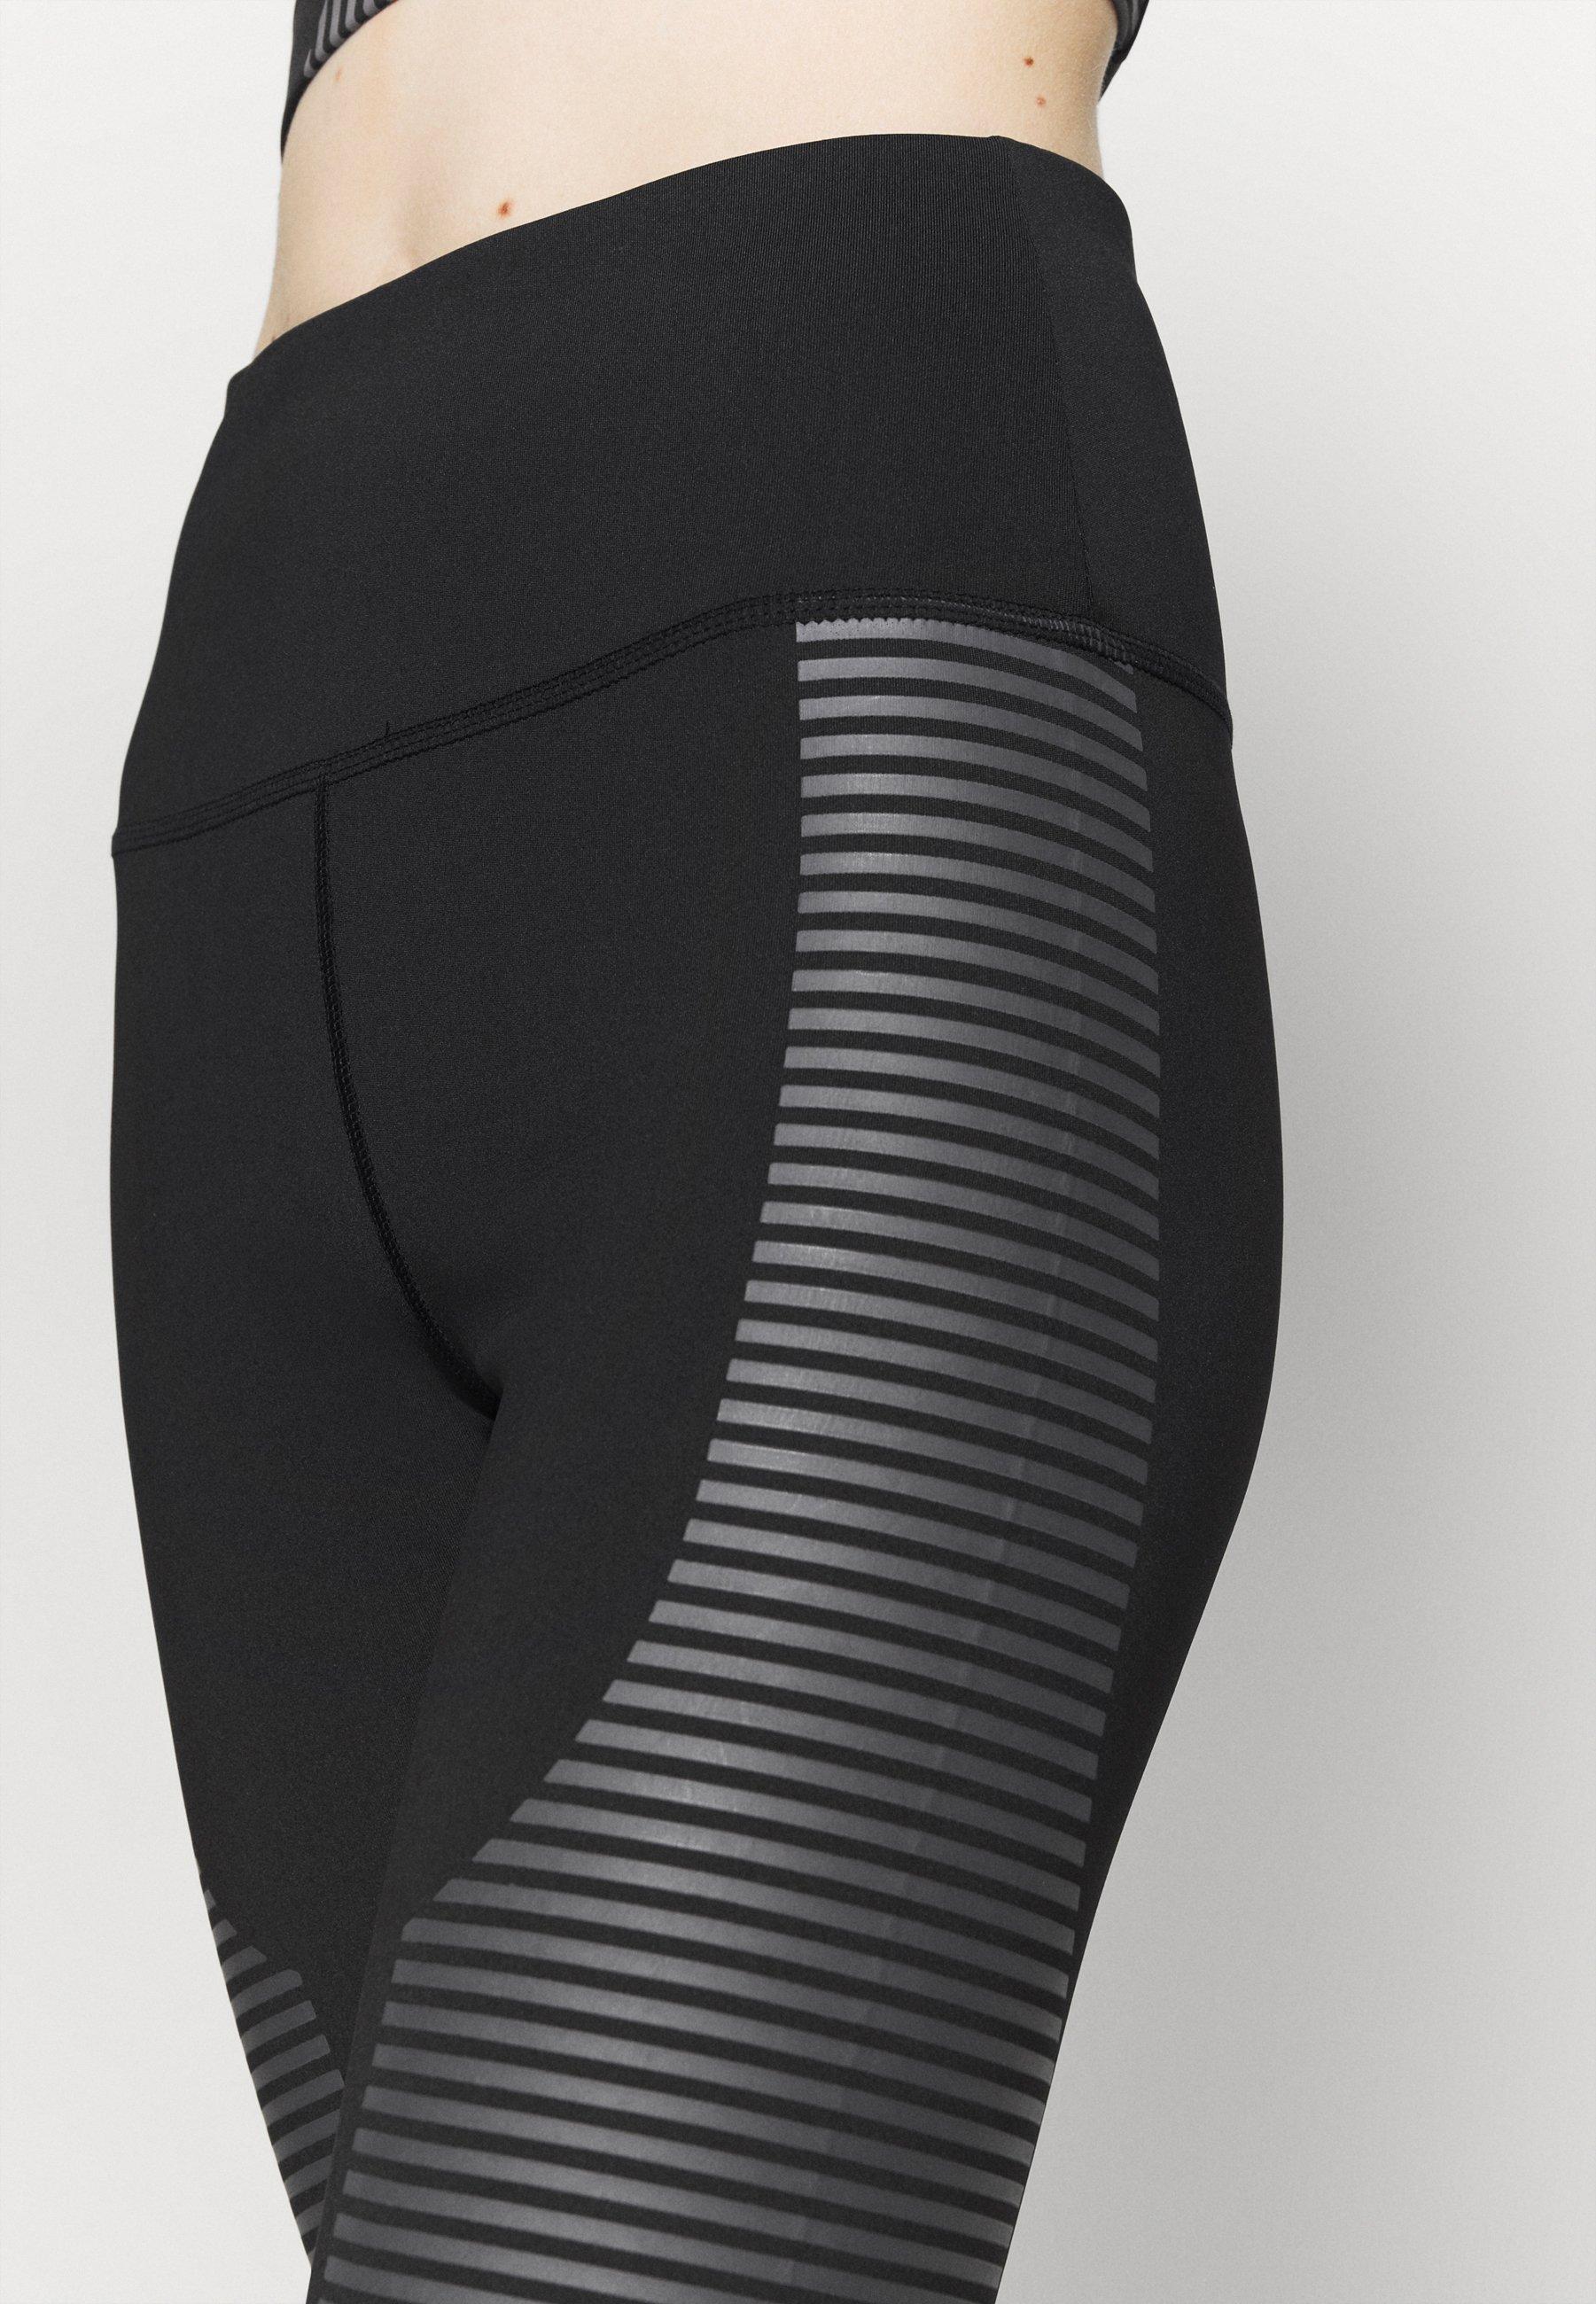 South Beach TONAL PRINT DETAIL LEGGING - Leggings - black/grey mZJ65